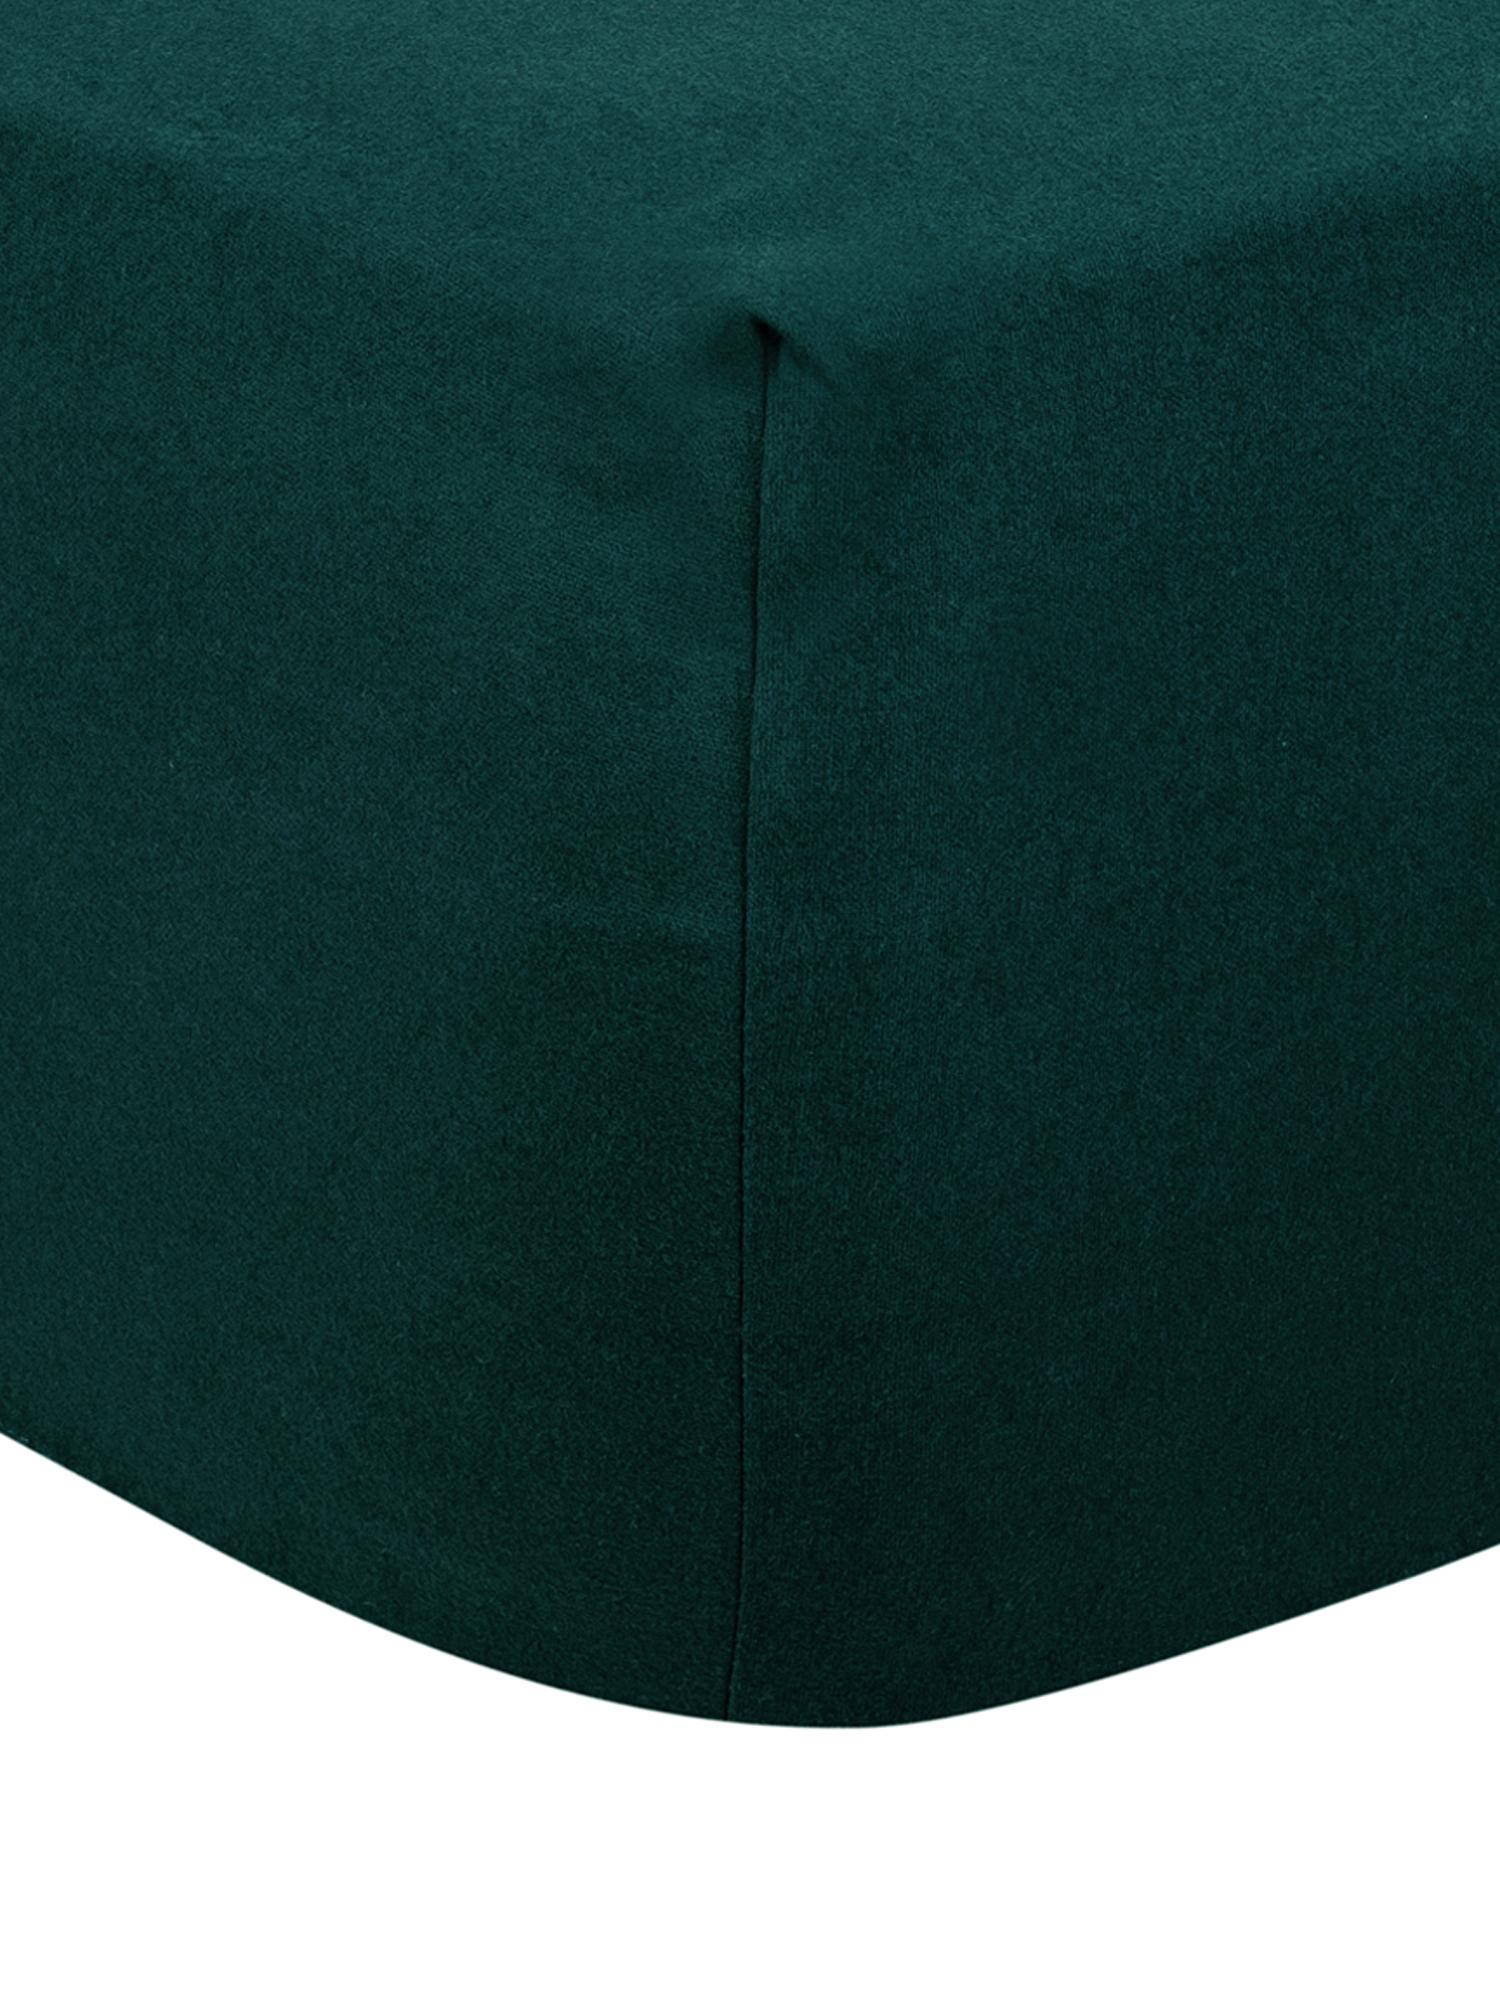 Sábana bajera de franela Biba, Verde, Cama 90 cm (90 x 200 cm)